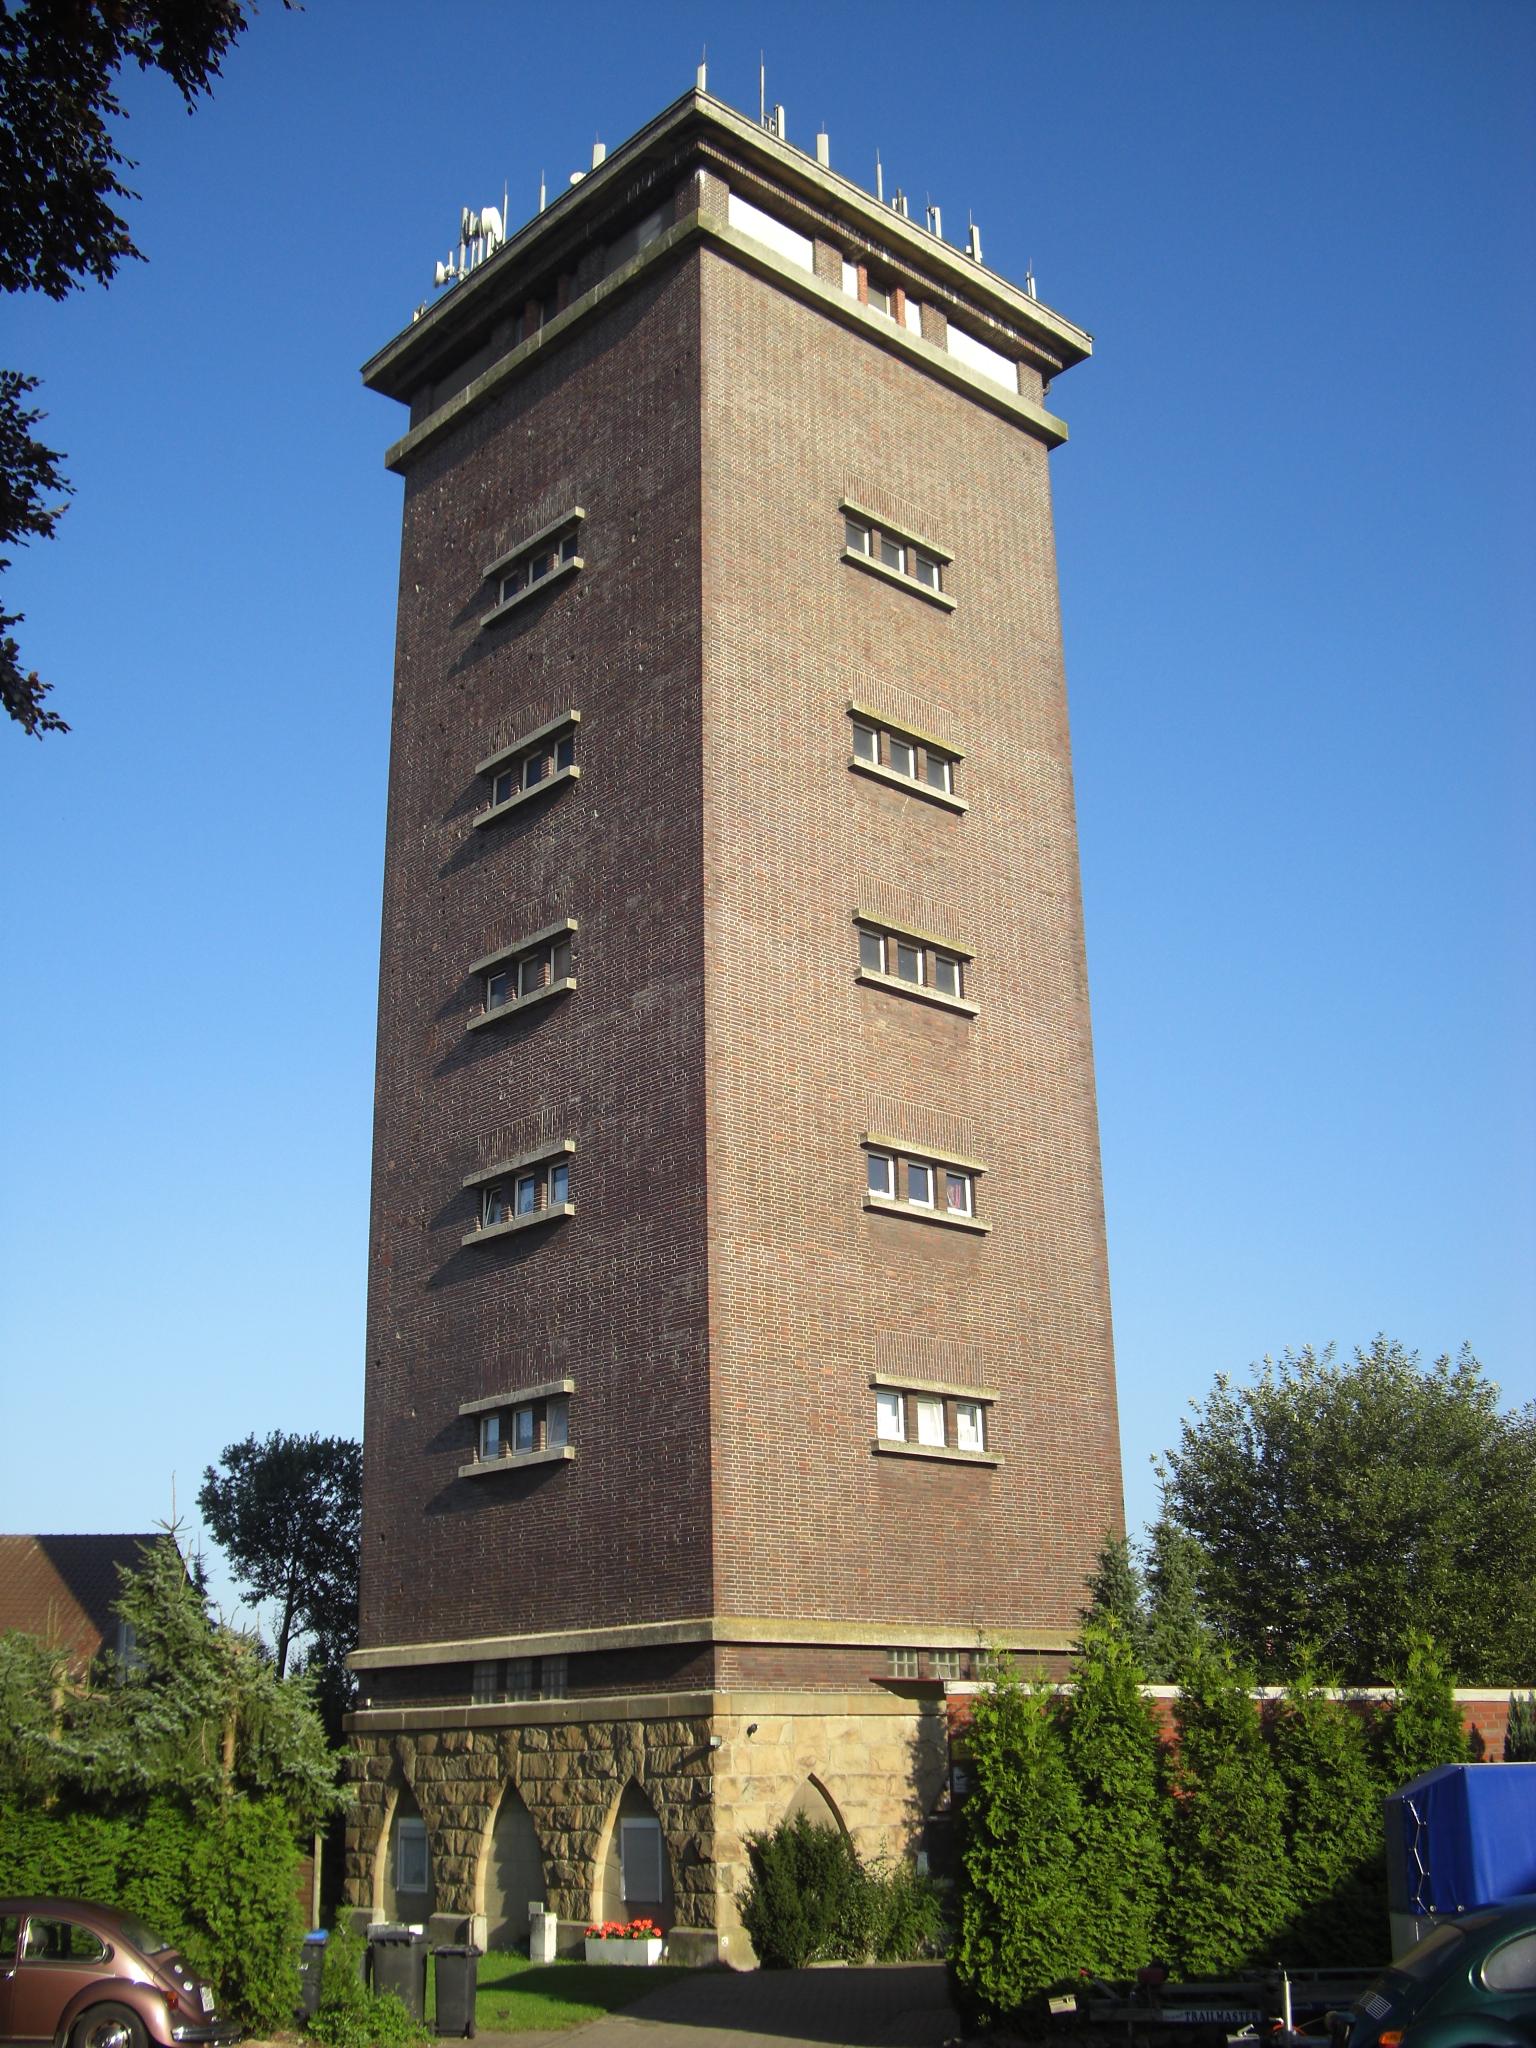 File Wasserturm Stadtlohn Jpg Wikimedia Commons